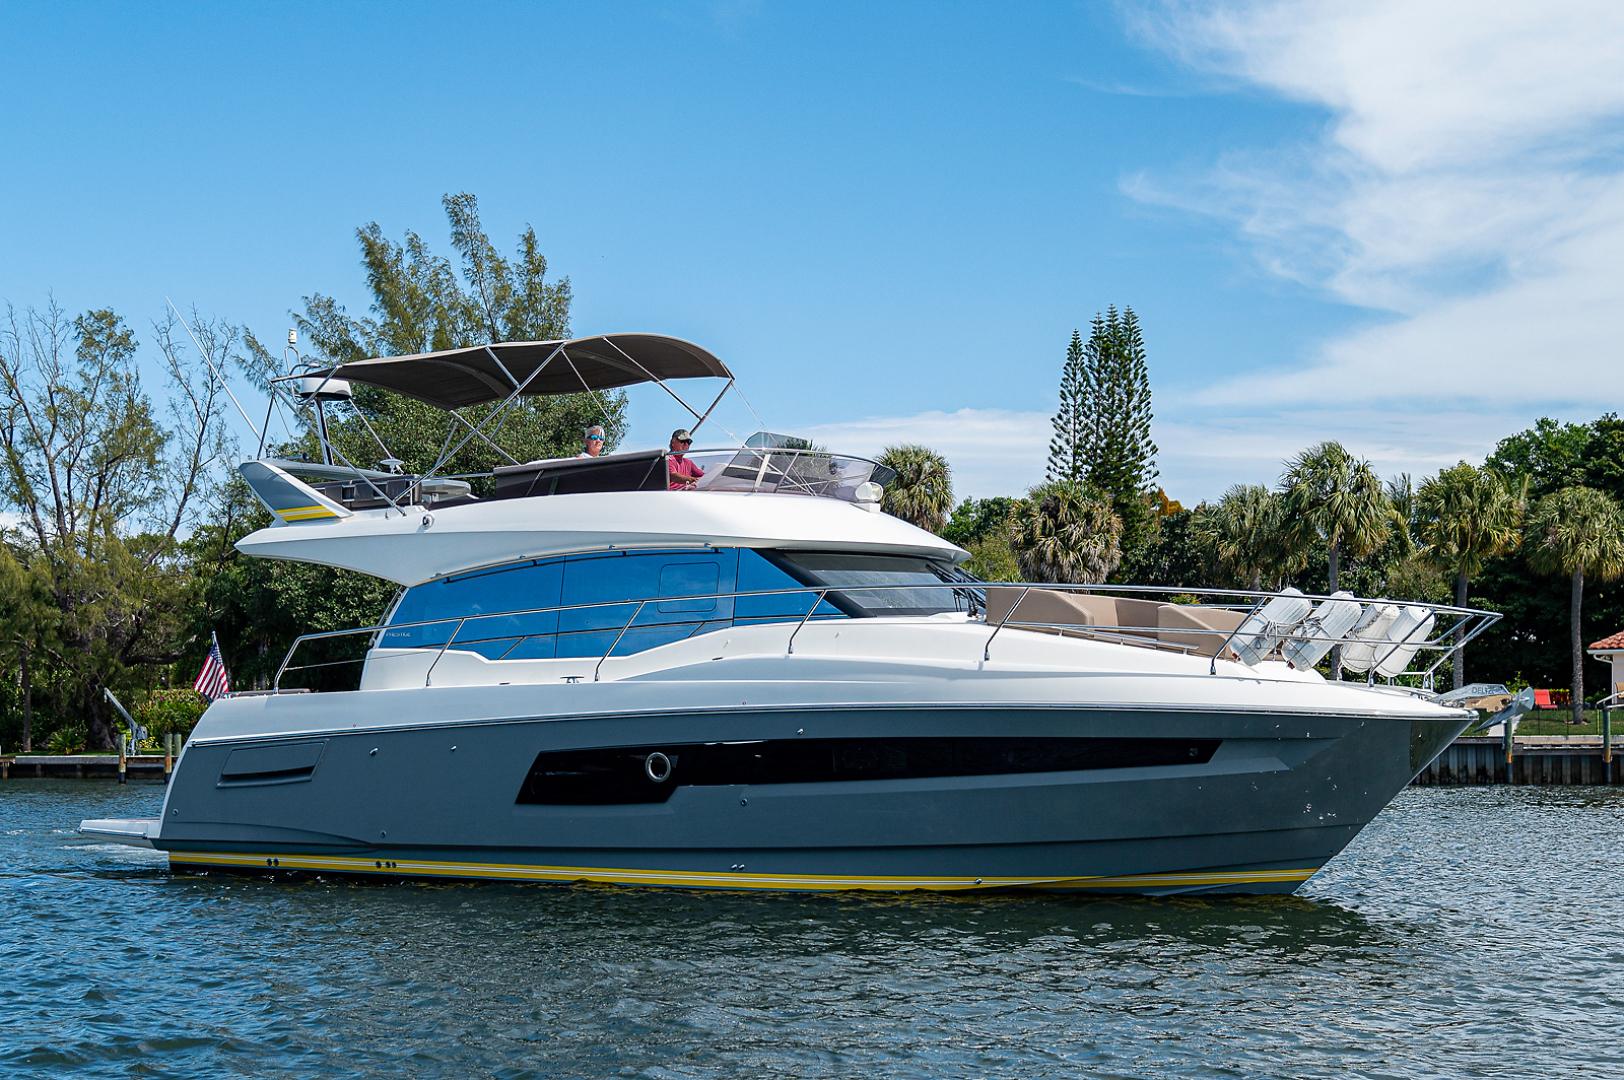 Prestige-460 Flybridge 2018-SEAQUEL Palm Beach Gardens-Florida-United States-Starboard Side-1351135 | Thumbnail